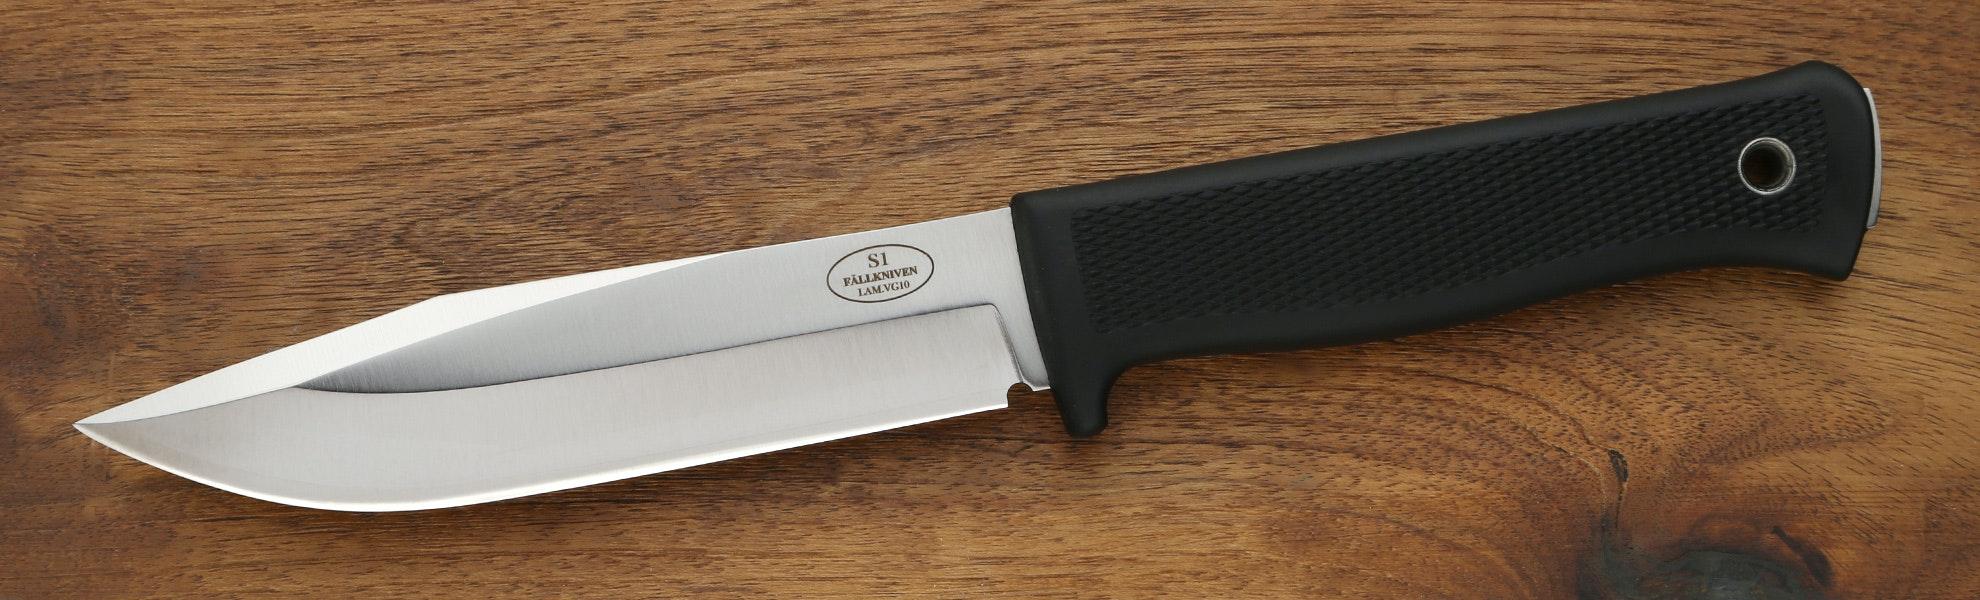 Fallkniven S1 Forest Knife w/Zytel Sheath